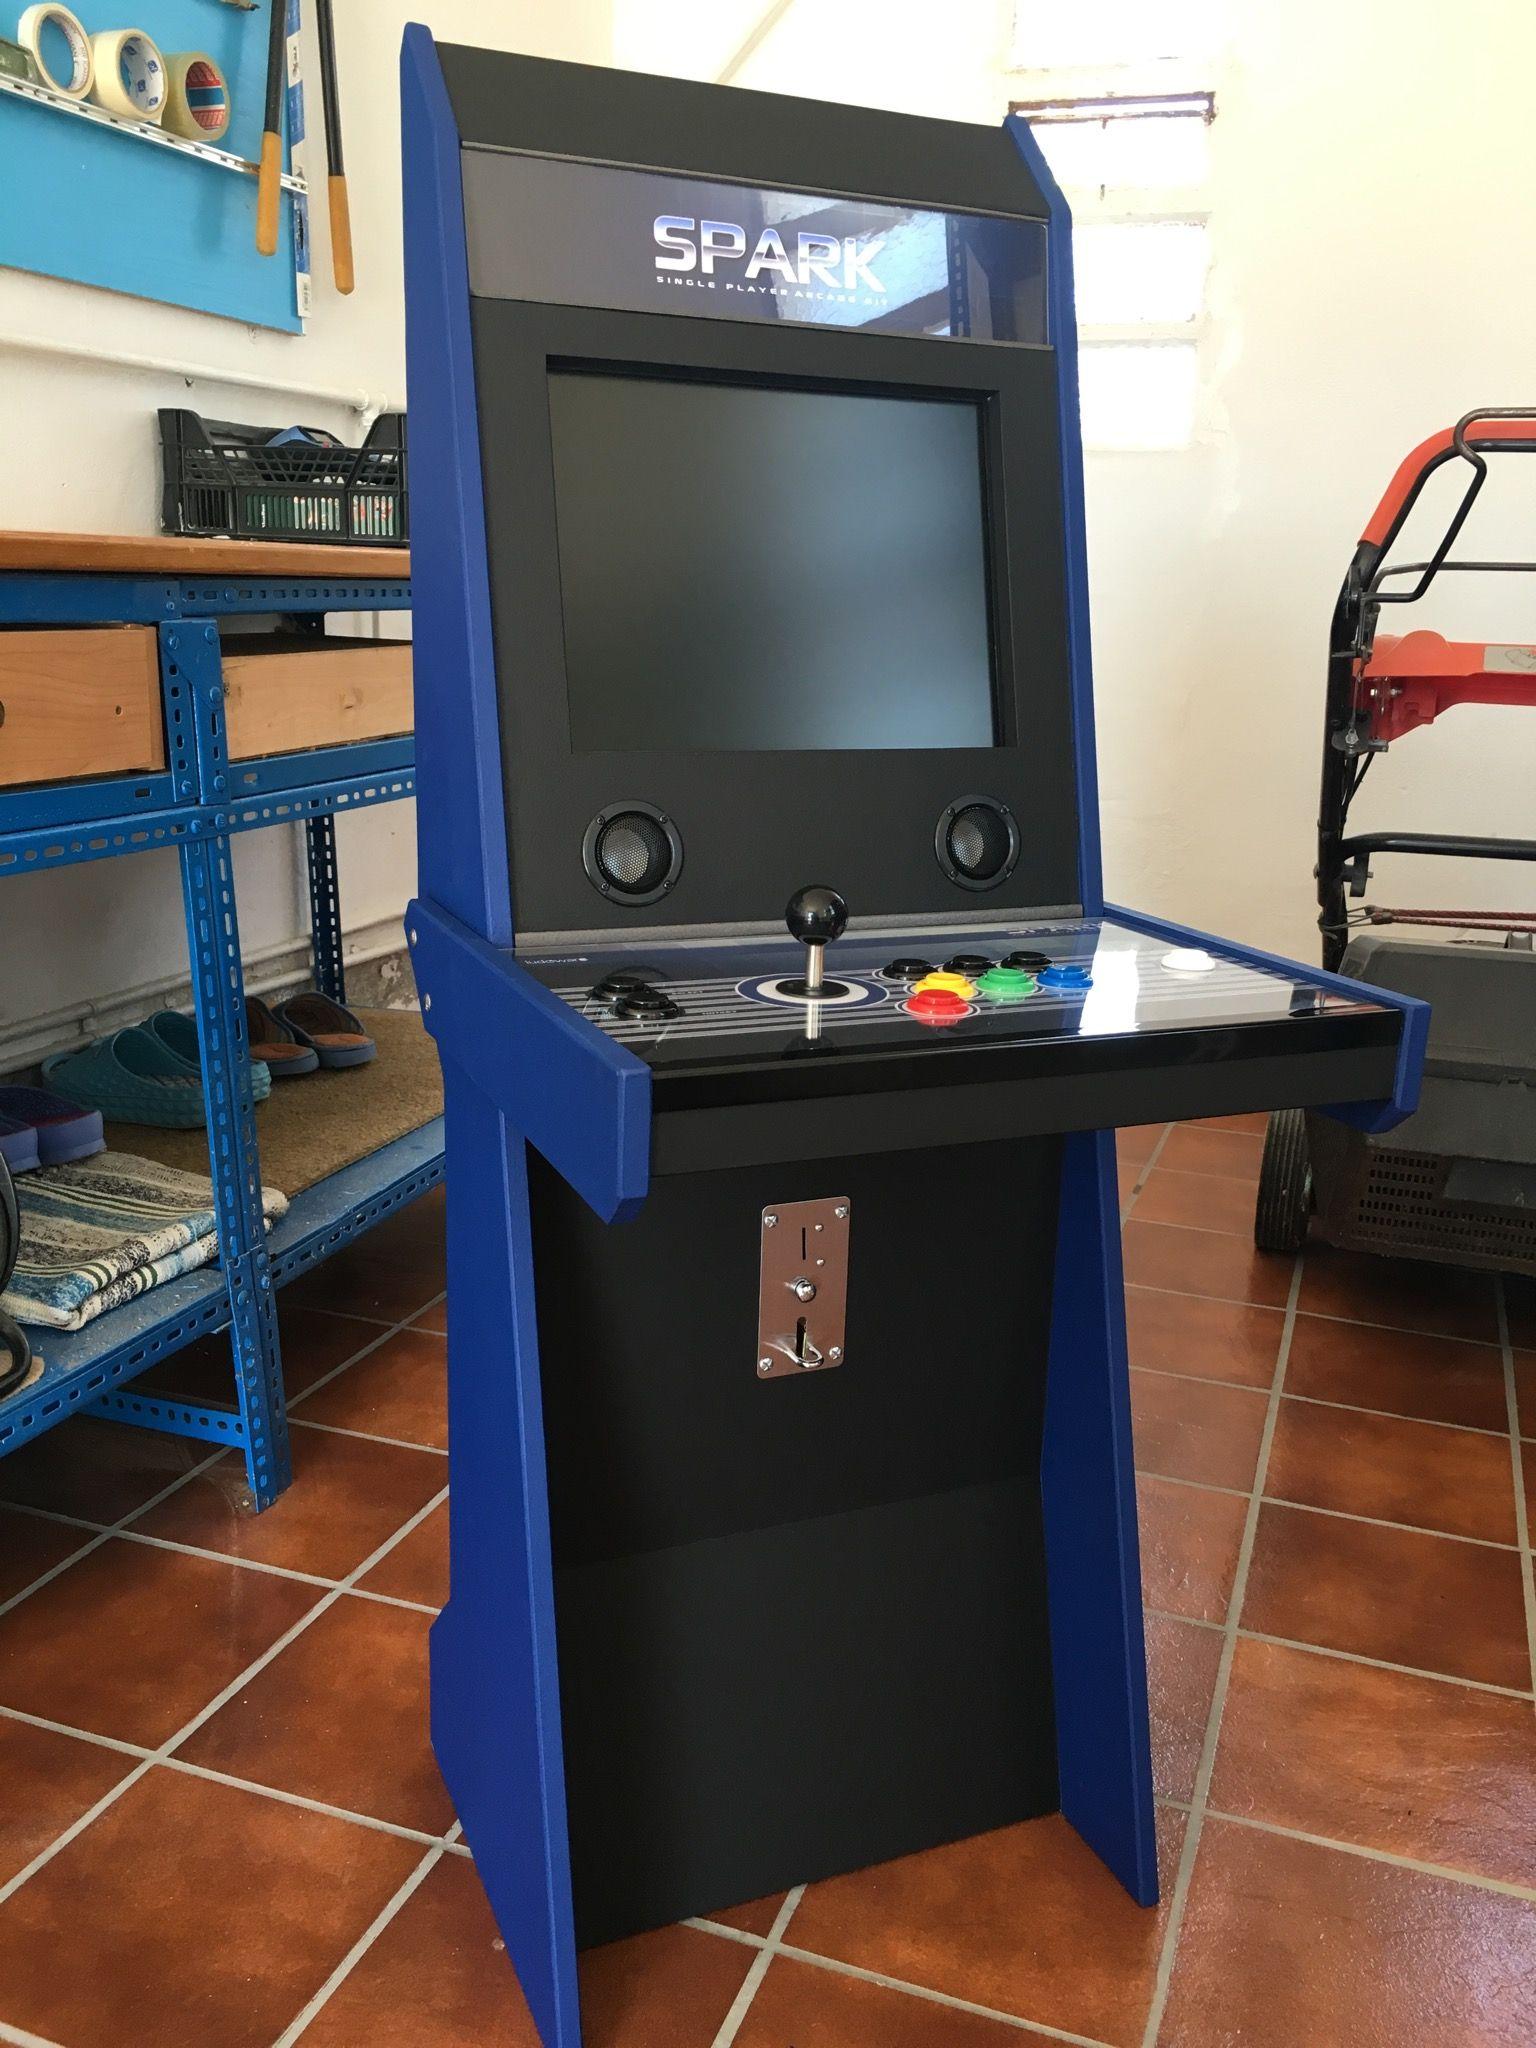 Single Player Arcade Sit Down Homemade Based On Vigolix